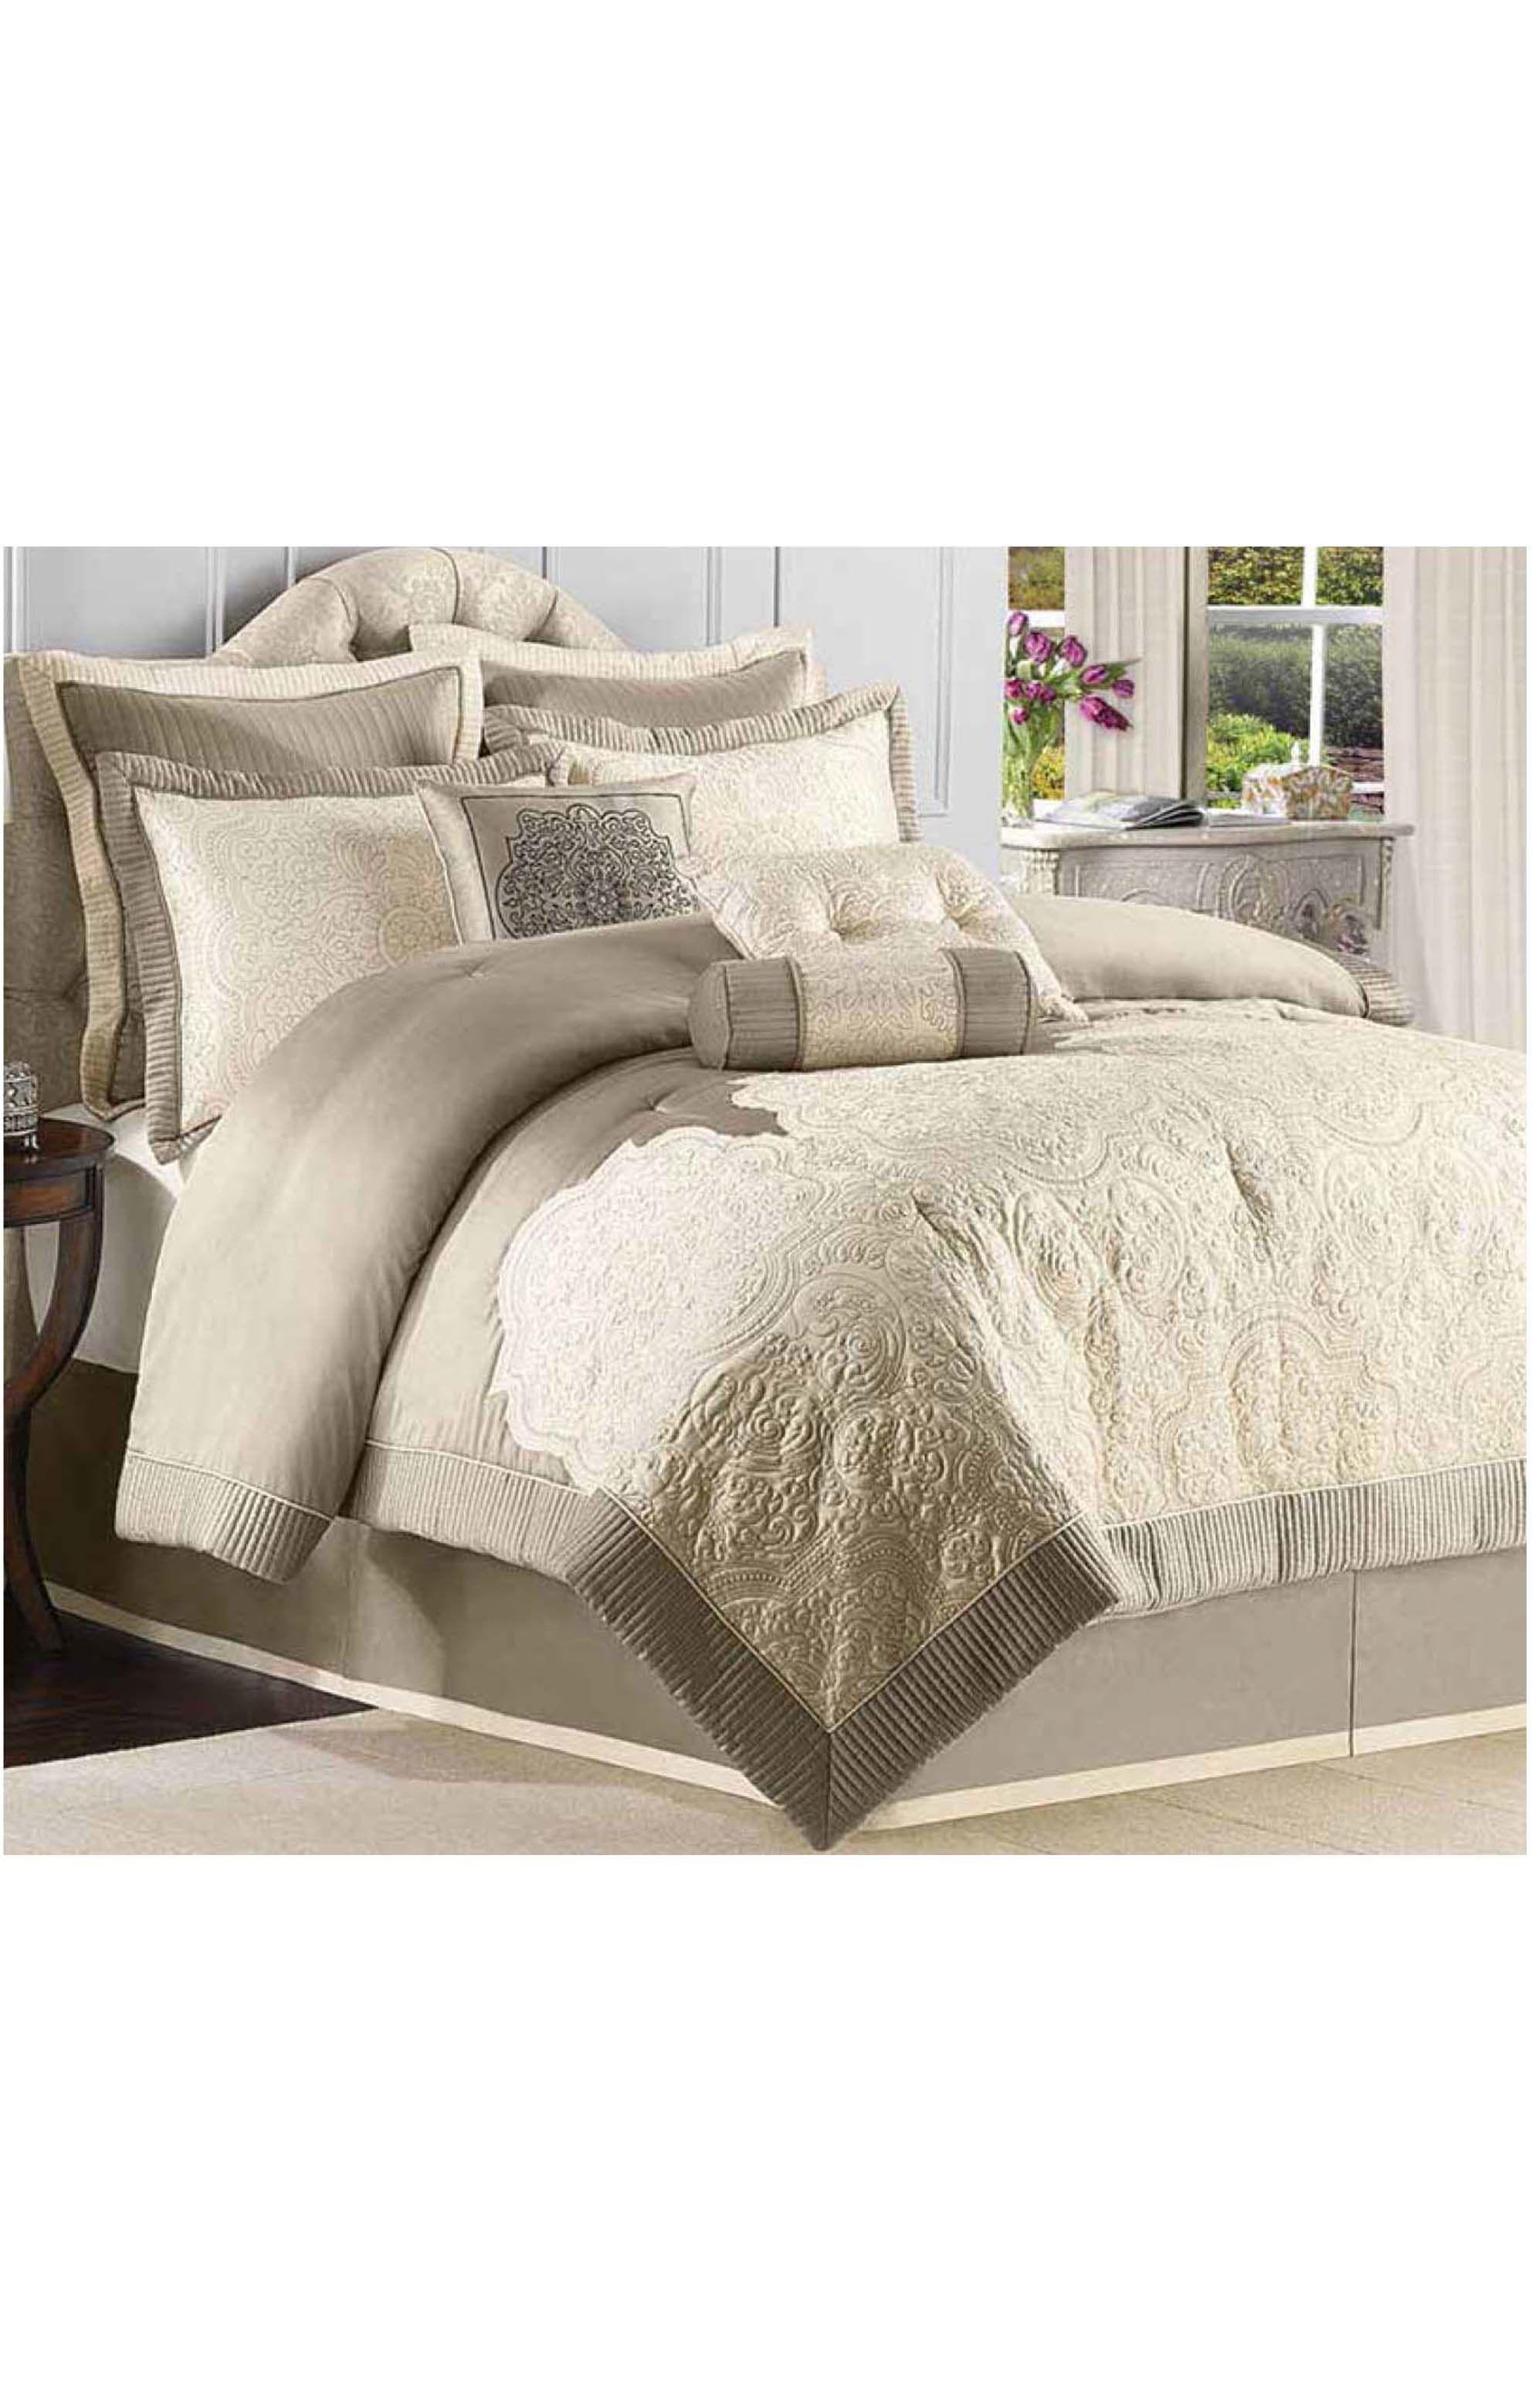 Quebec Bedroom Furniture Mostrar Detalles Para Dormireal Edredon Quebec Edredones